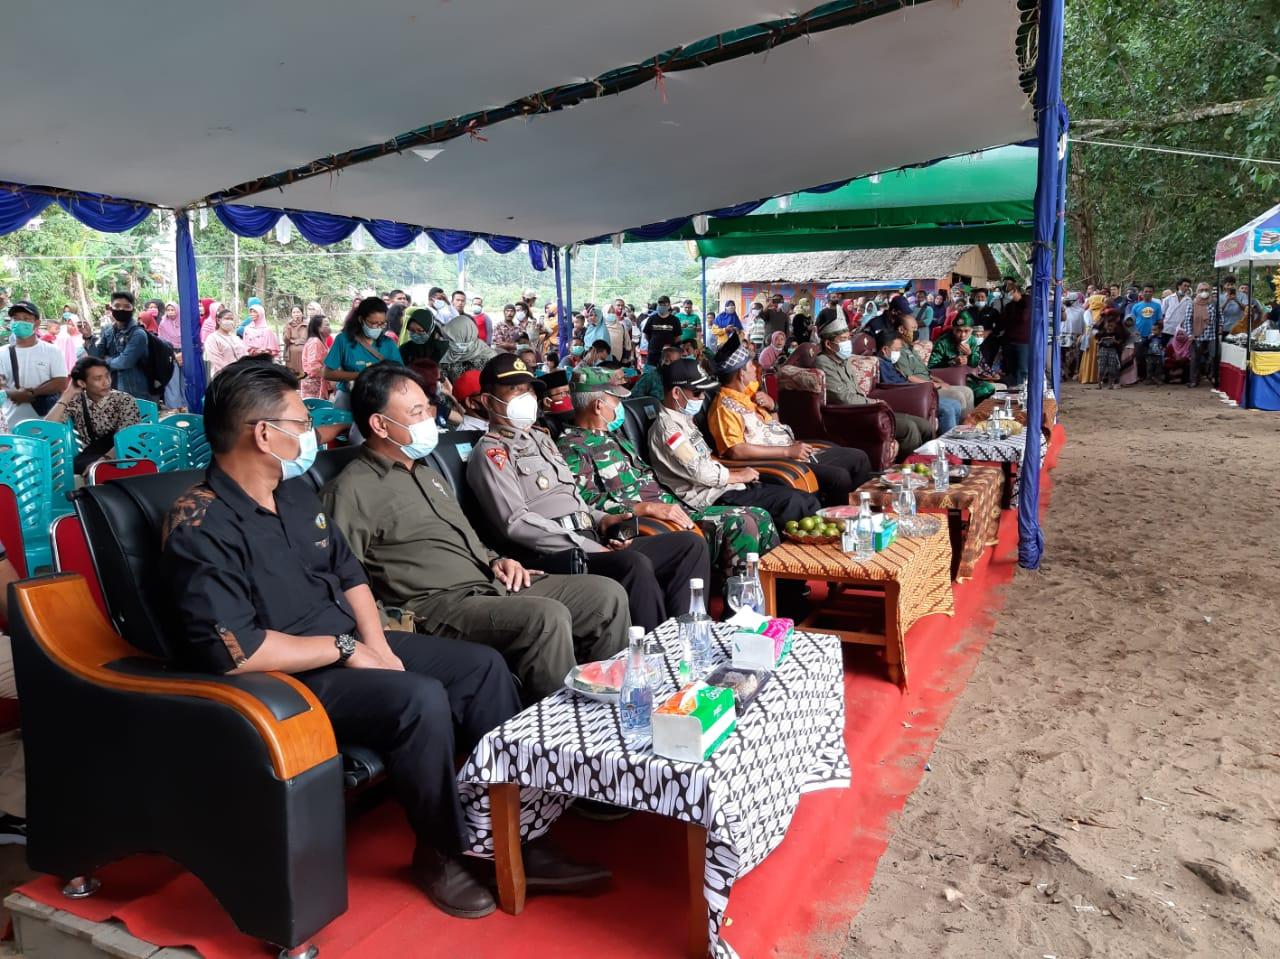 Peresmian Stasiun Riset Cabang Panti dan Soft Launching Desa Wisata Gunung Sembilan Taman Nasional Gunung Palung